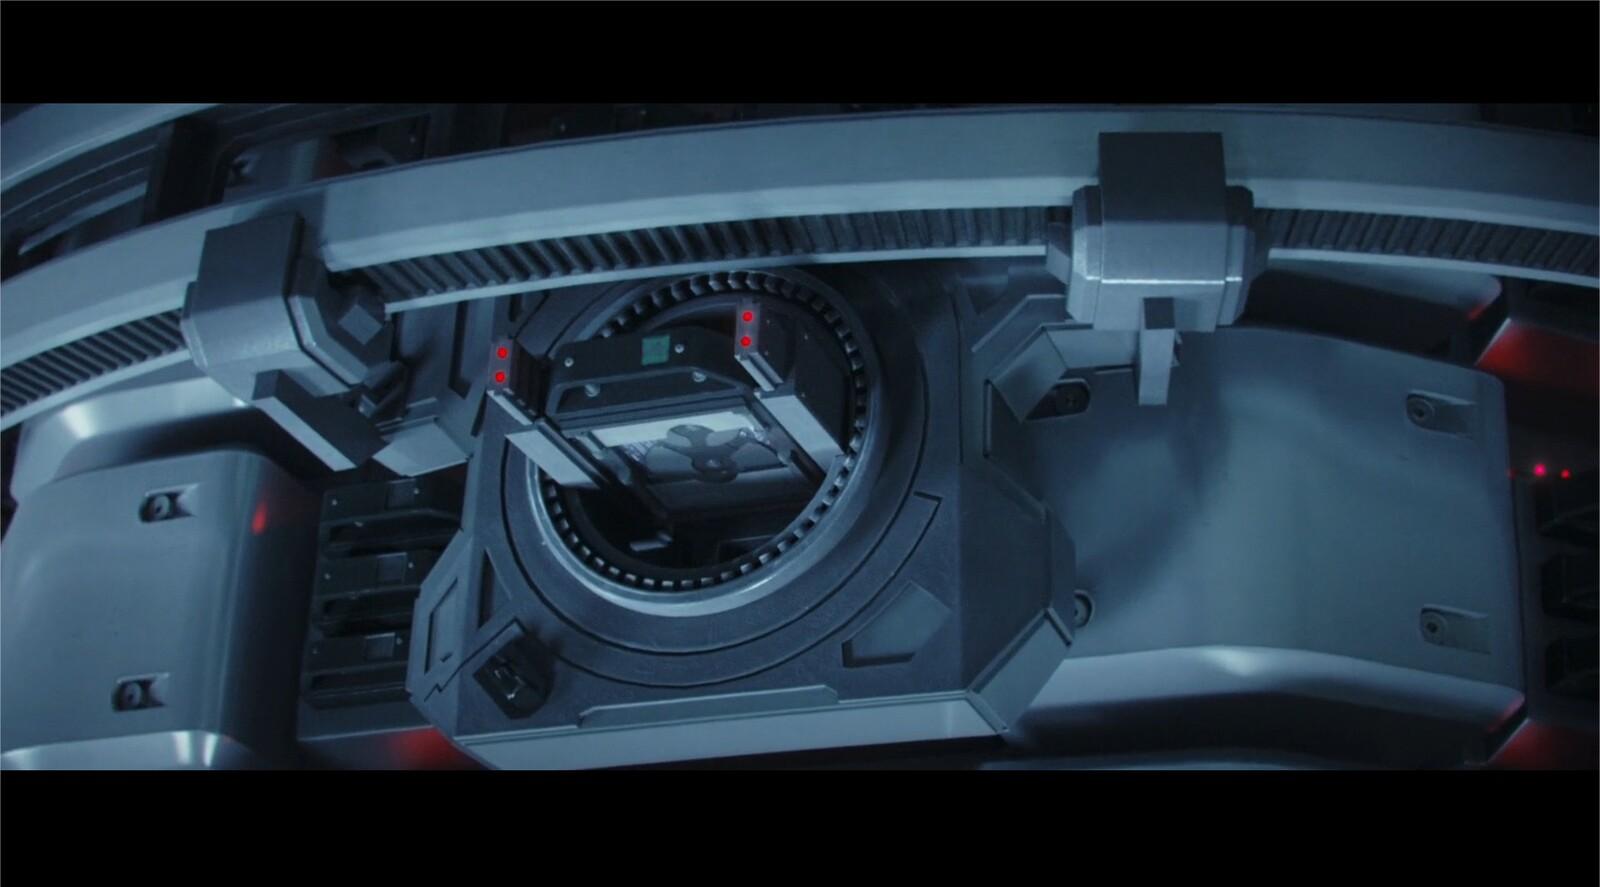 Full CG modeling of the hard drive